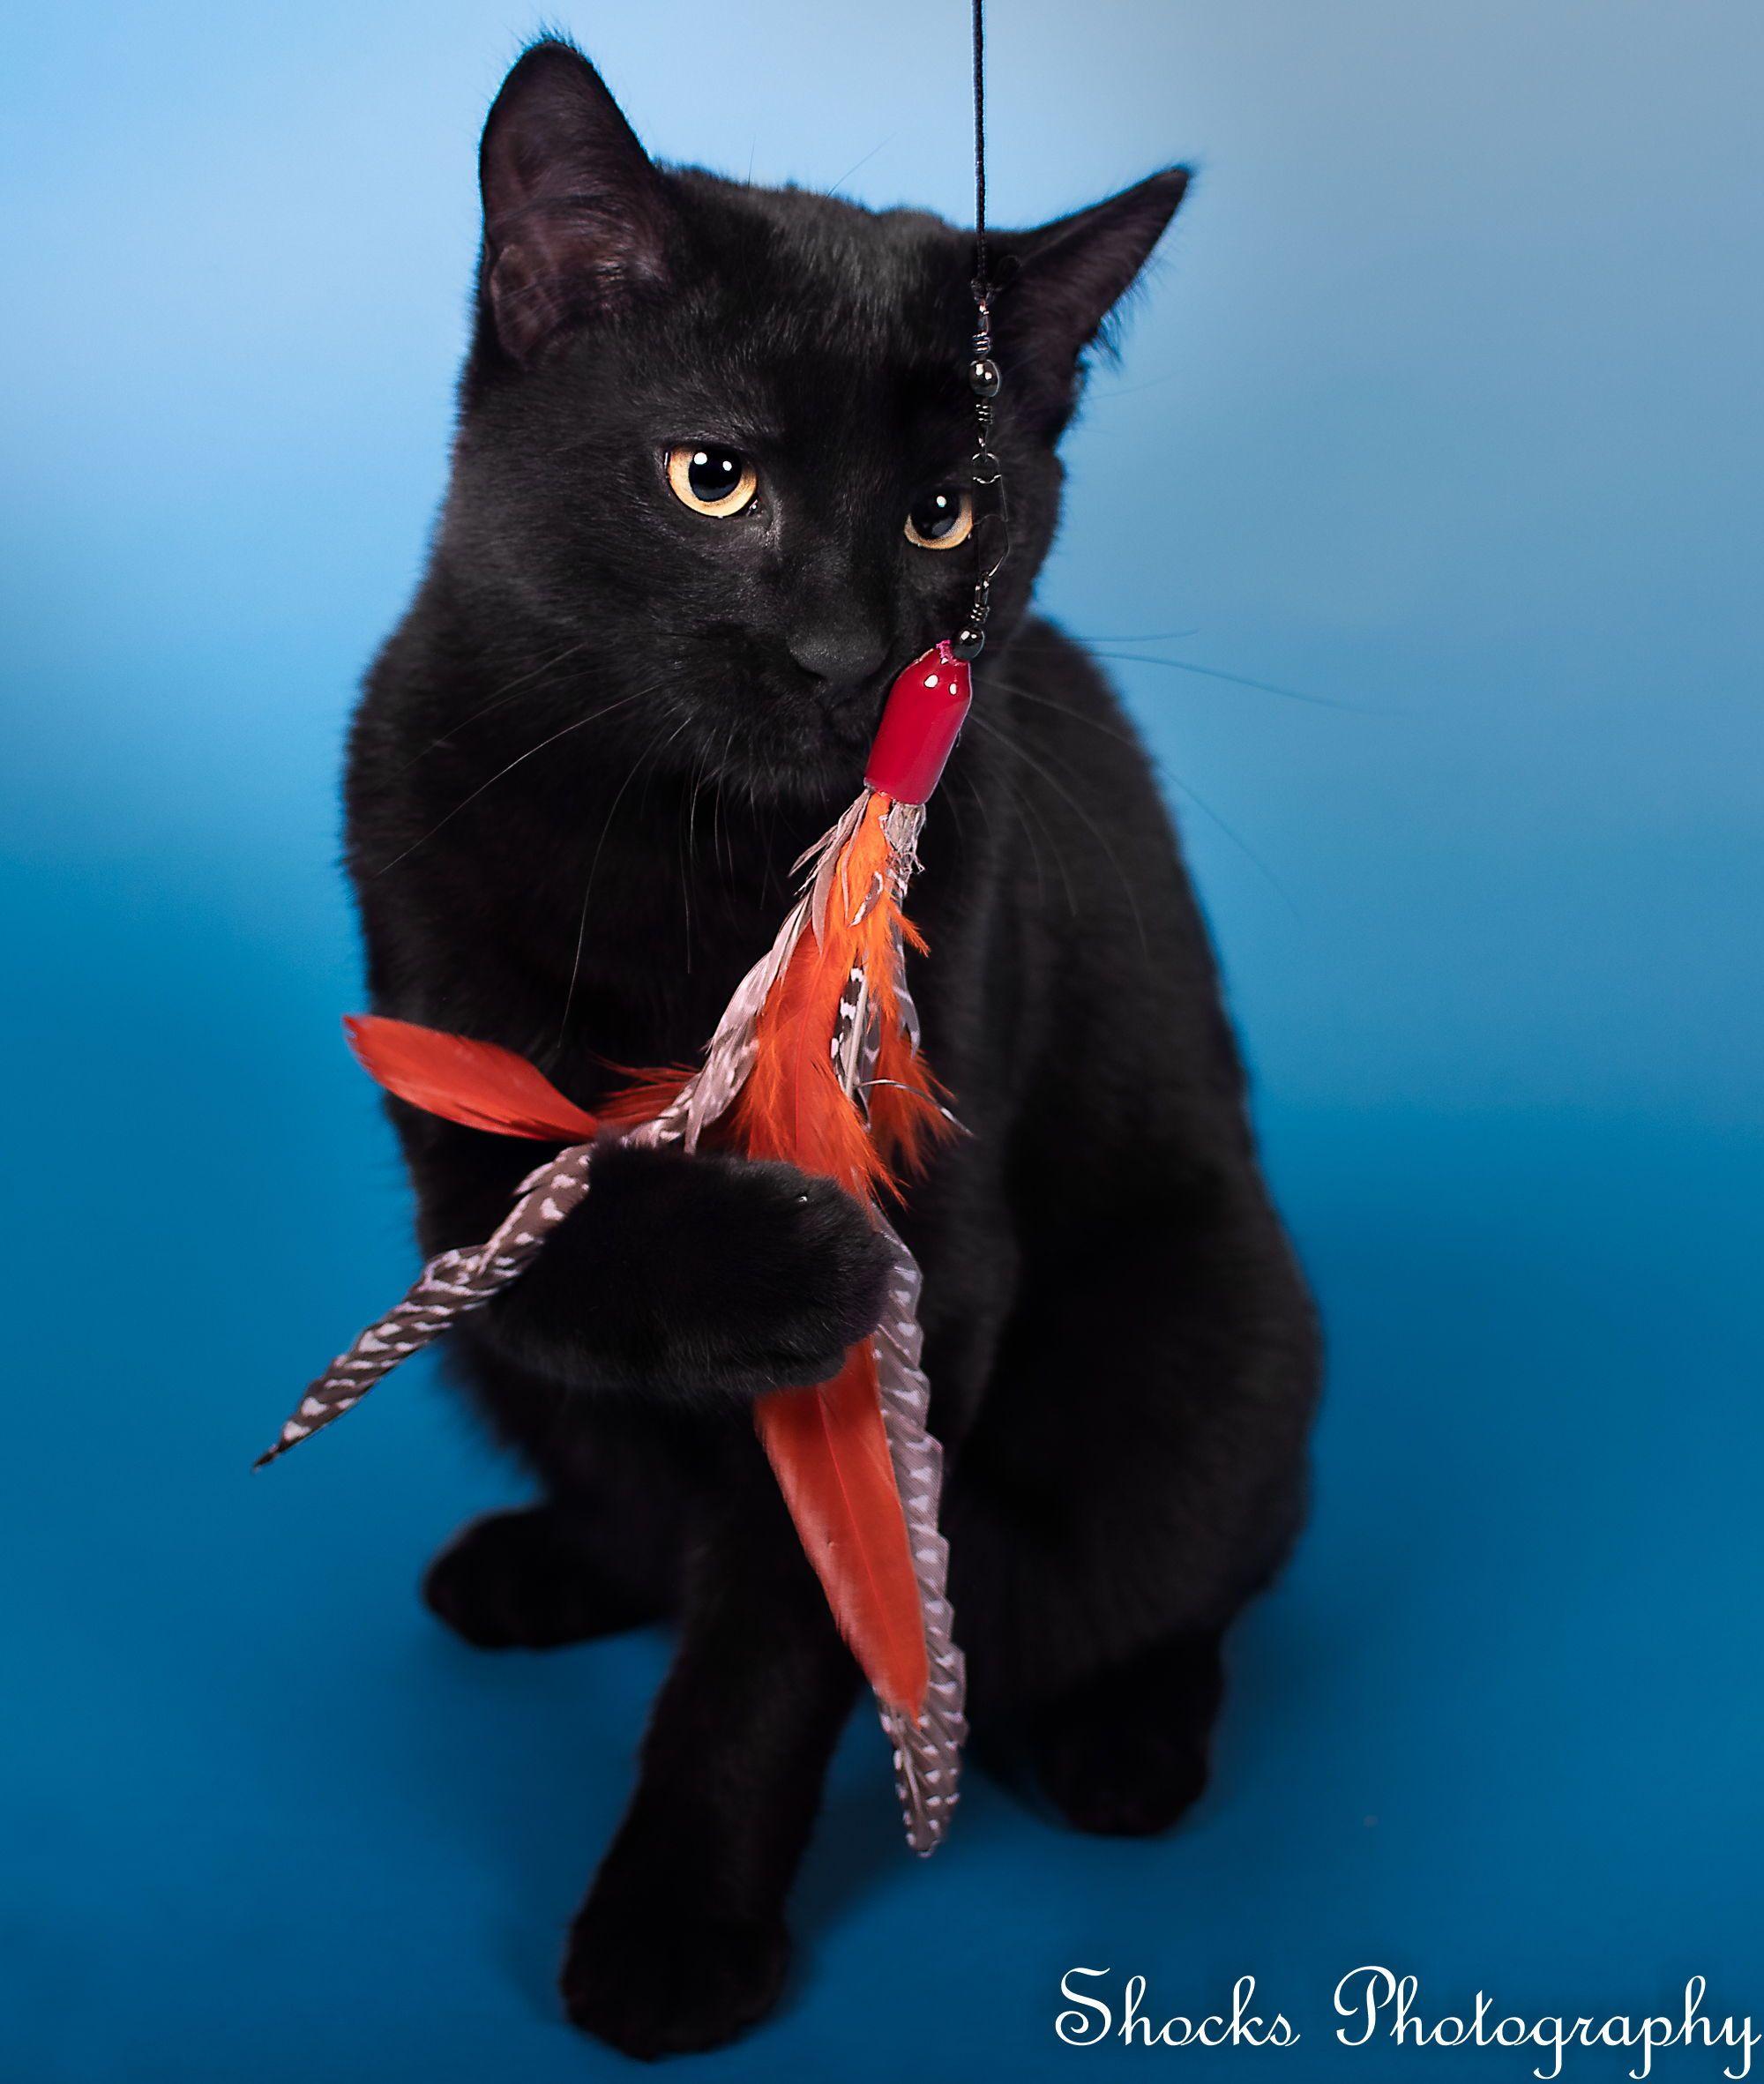 Black Cat Cat Cat Photos Kitten Black Kitten Funny Kitten In 2020 Kittens Cutest Cute Cats And Kittens Cat Photography